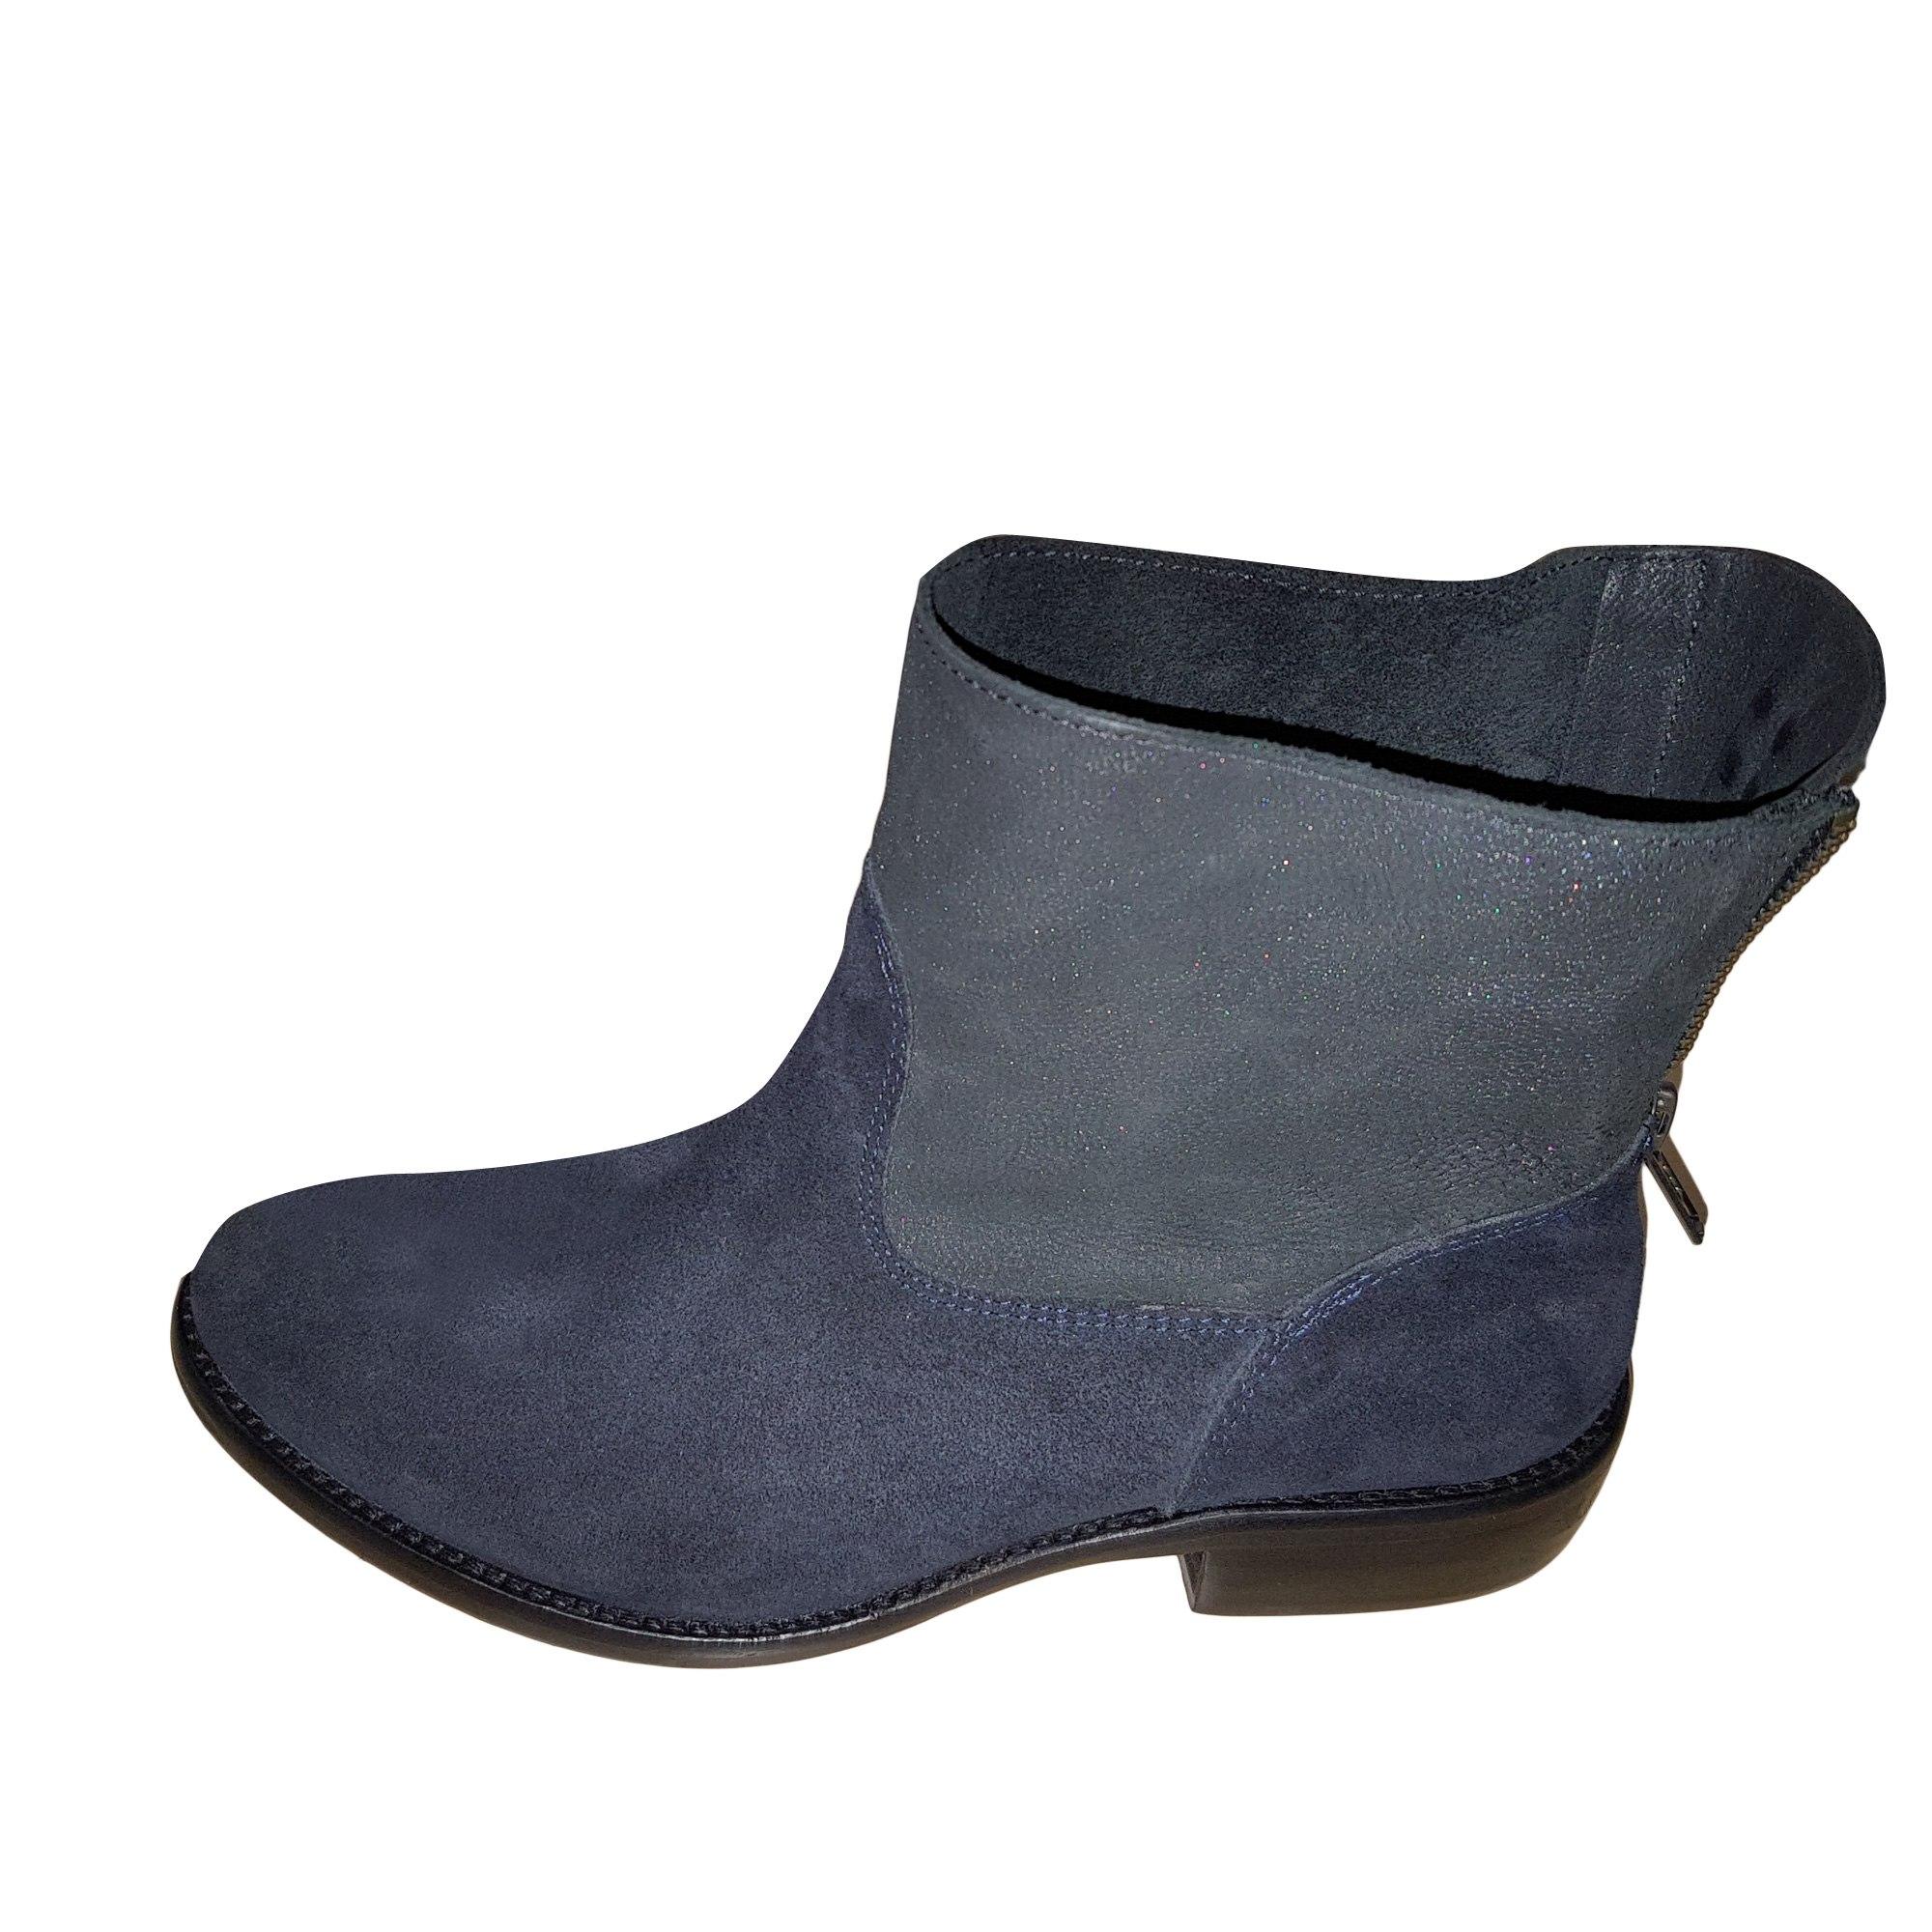 Boots Berenice Low Bleu 5529756 Plates amp; 36 Bottines 6xBAnOqUWn